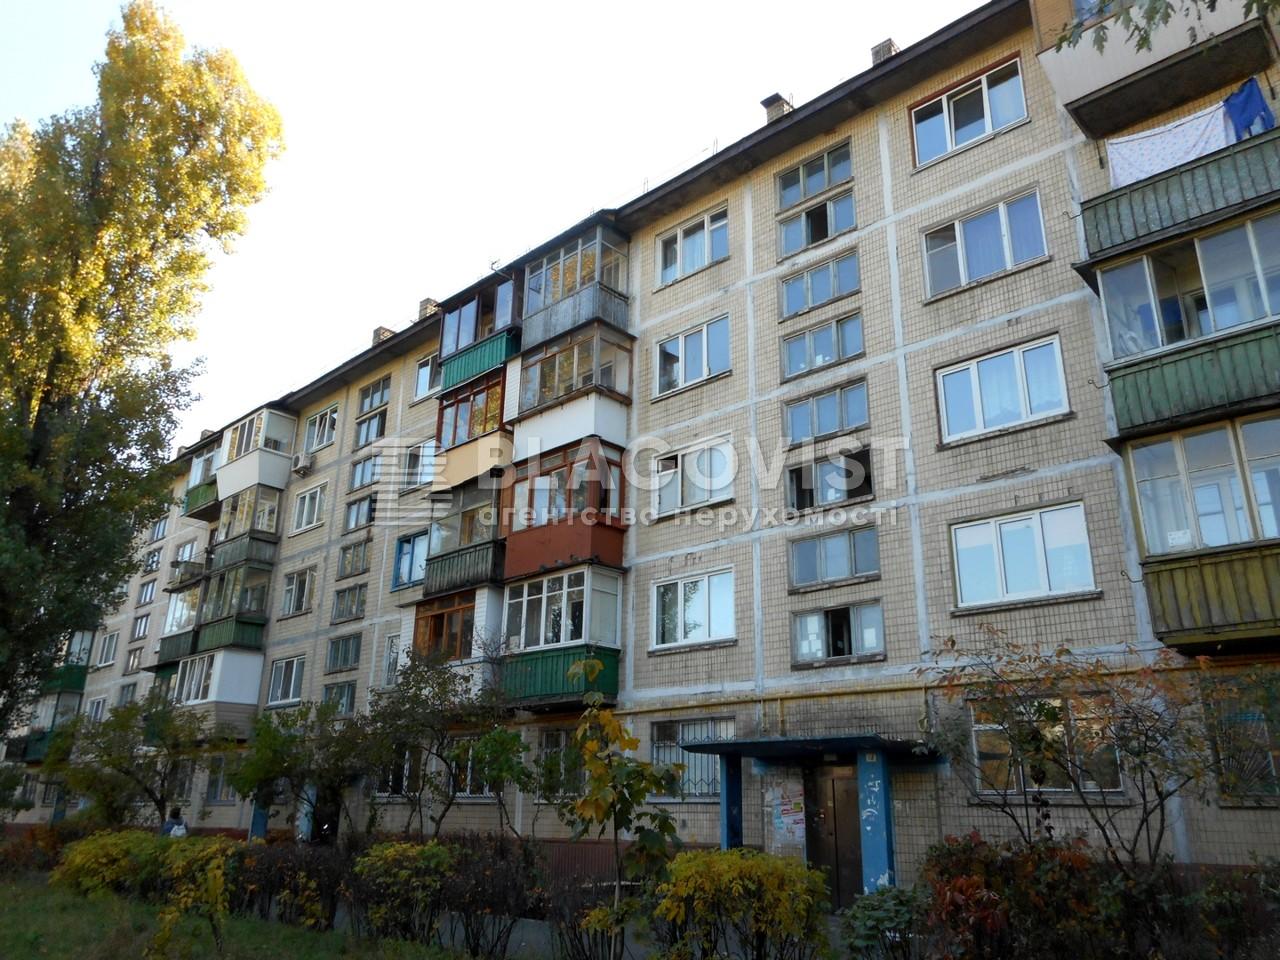 Квартира F-38518, Перова бульв., 40а, Киев - Фото 3